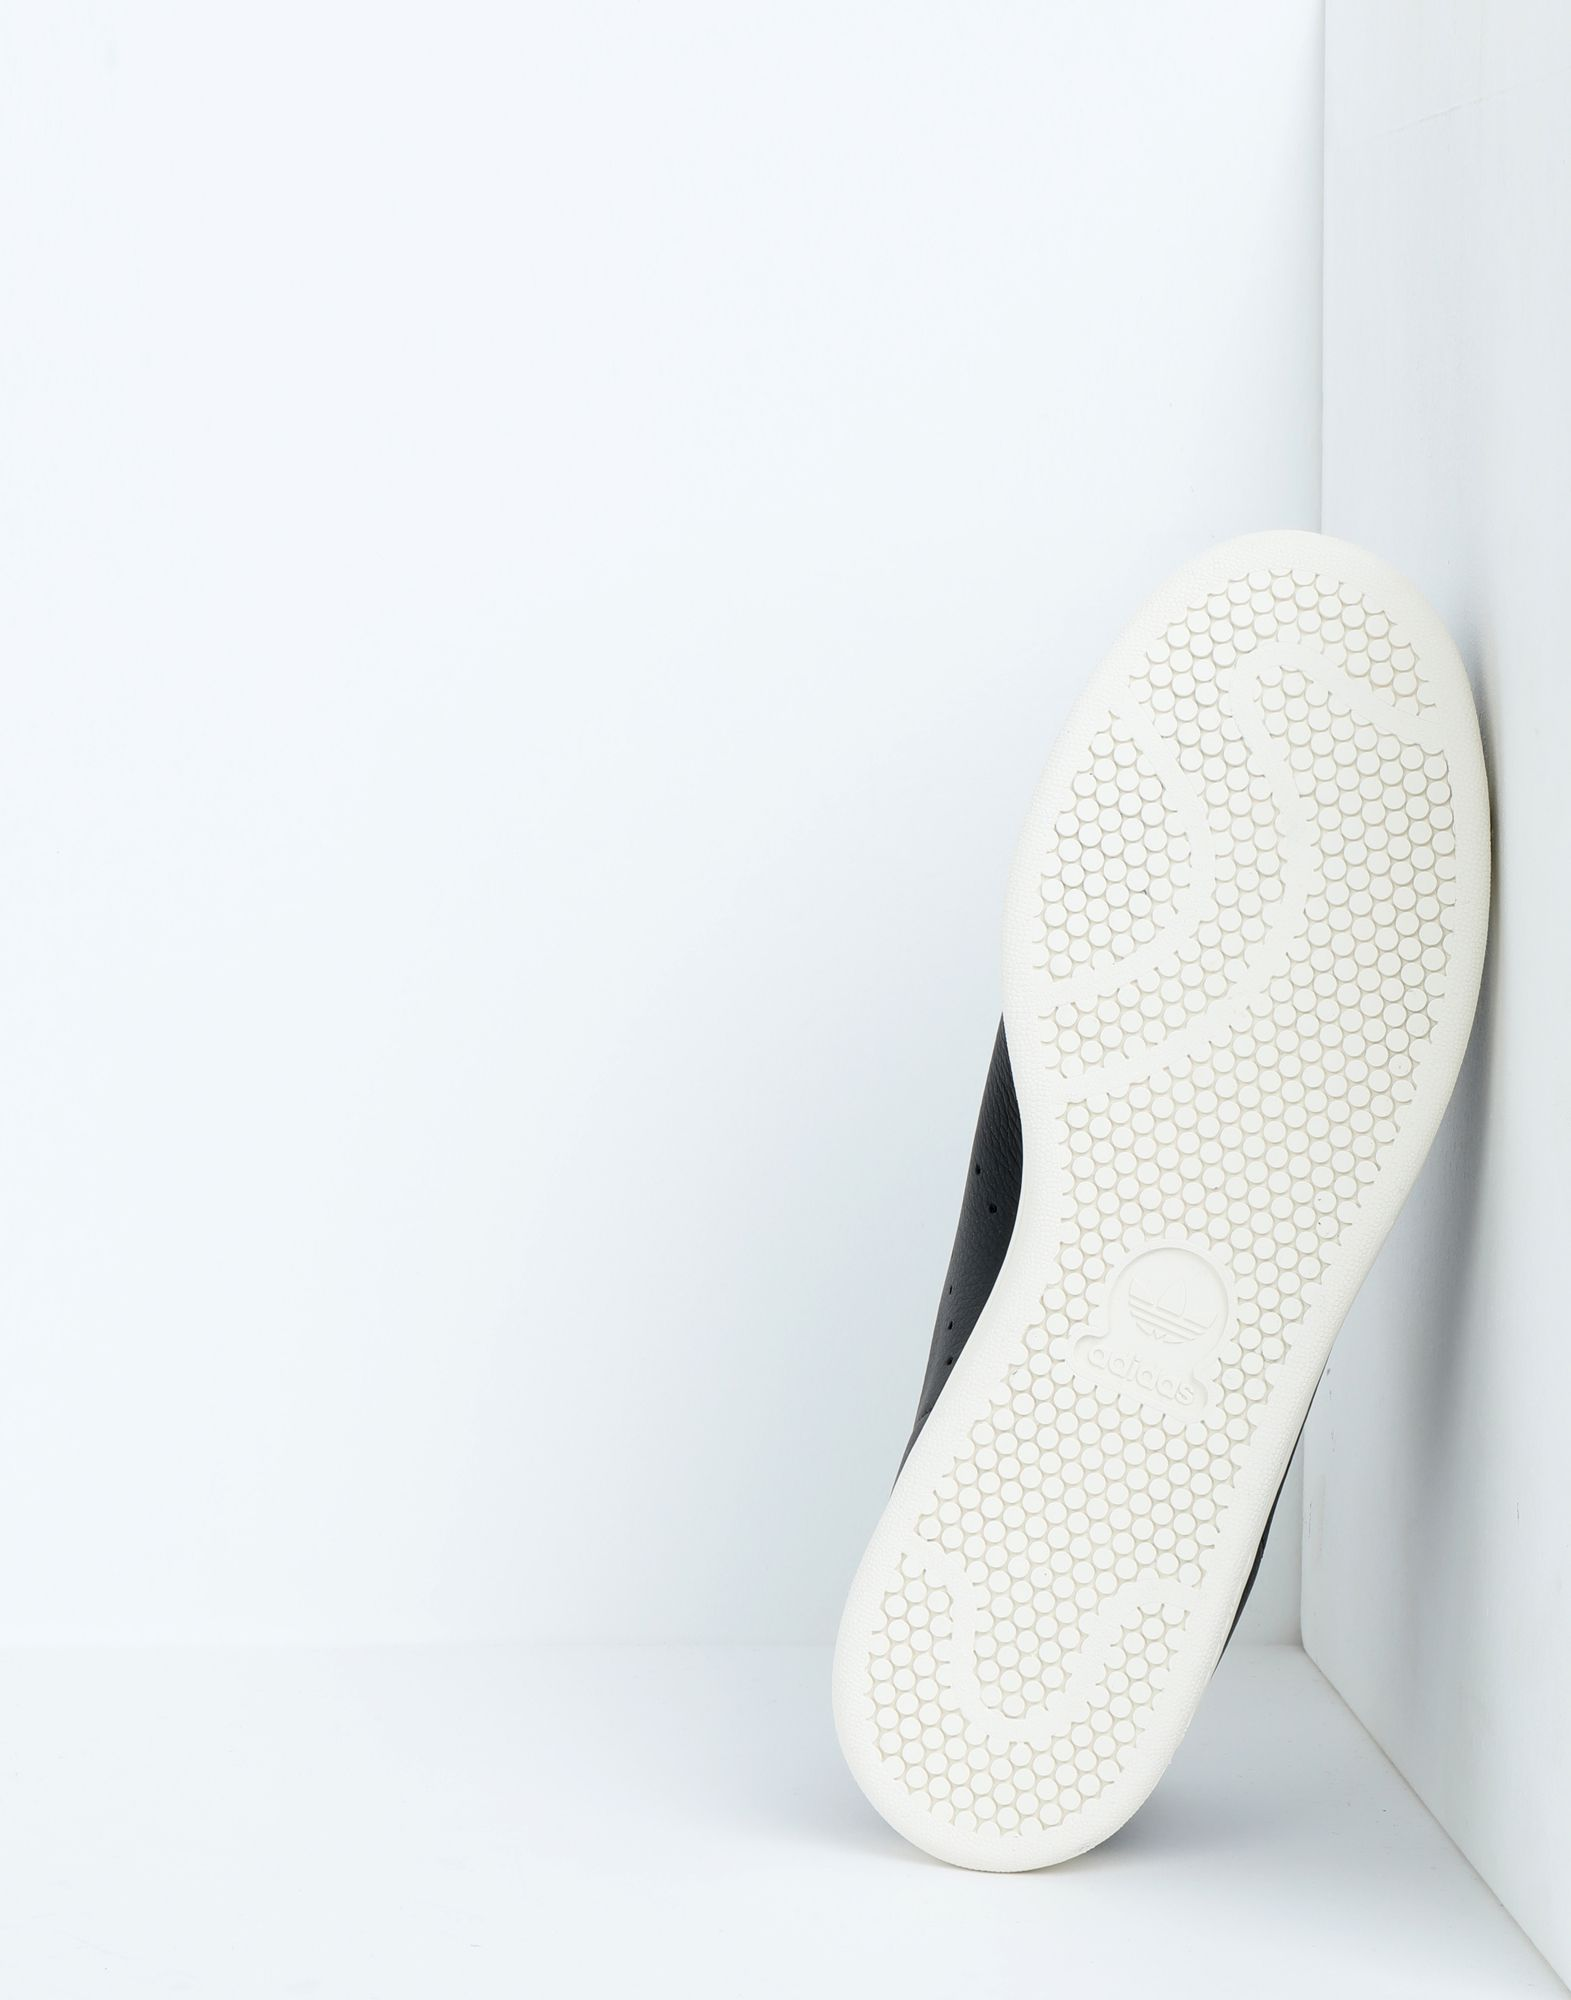 Rabatt echte Schuhe Adidas Originals Originals Originals Stan Smith Premium  11565946PL ef30f5